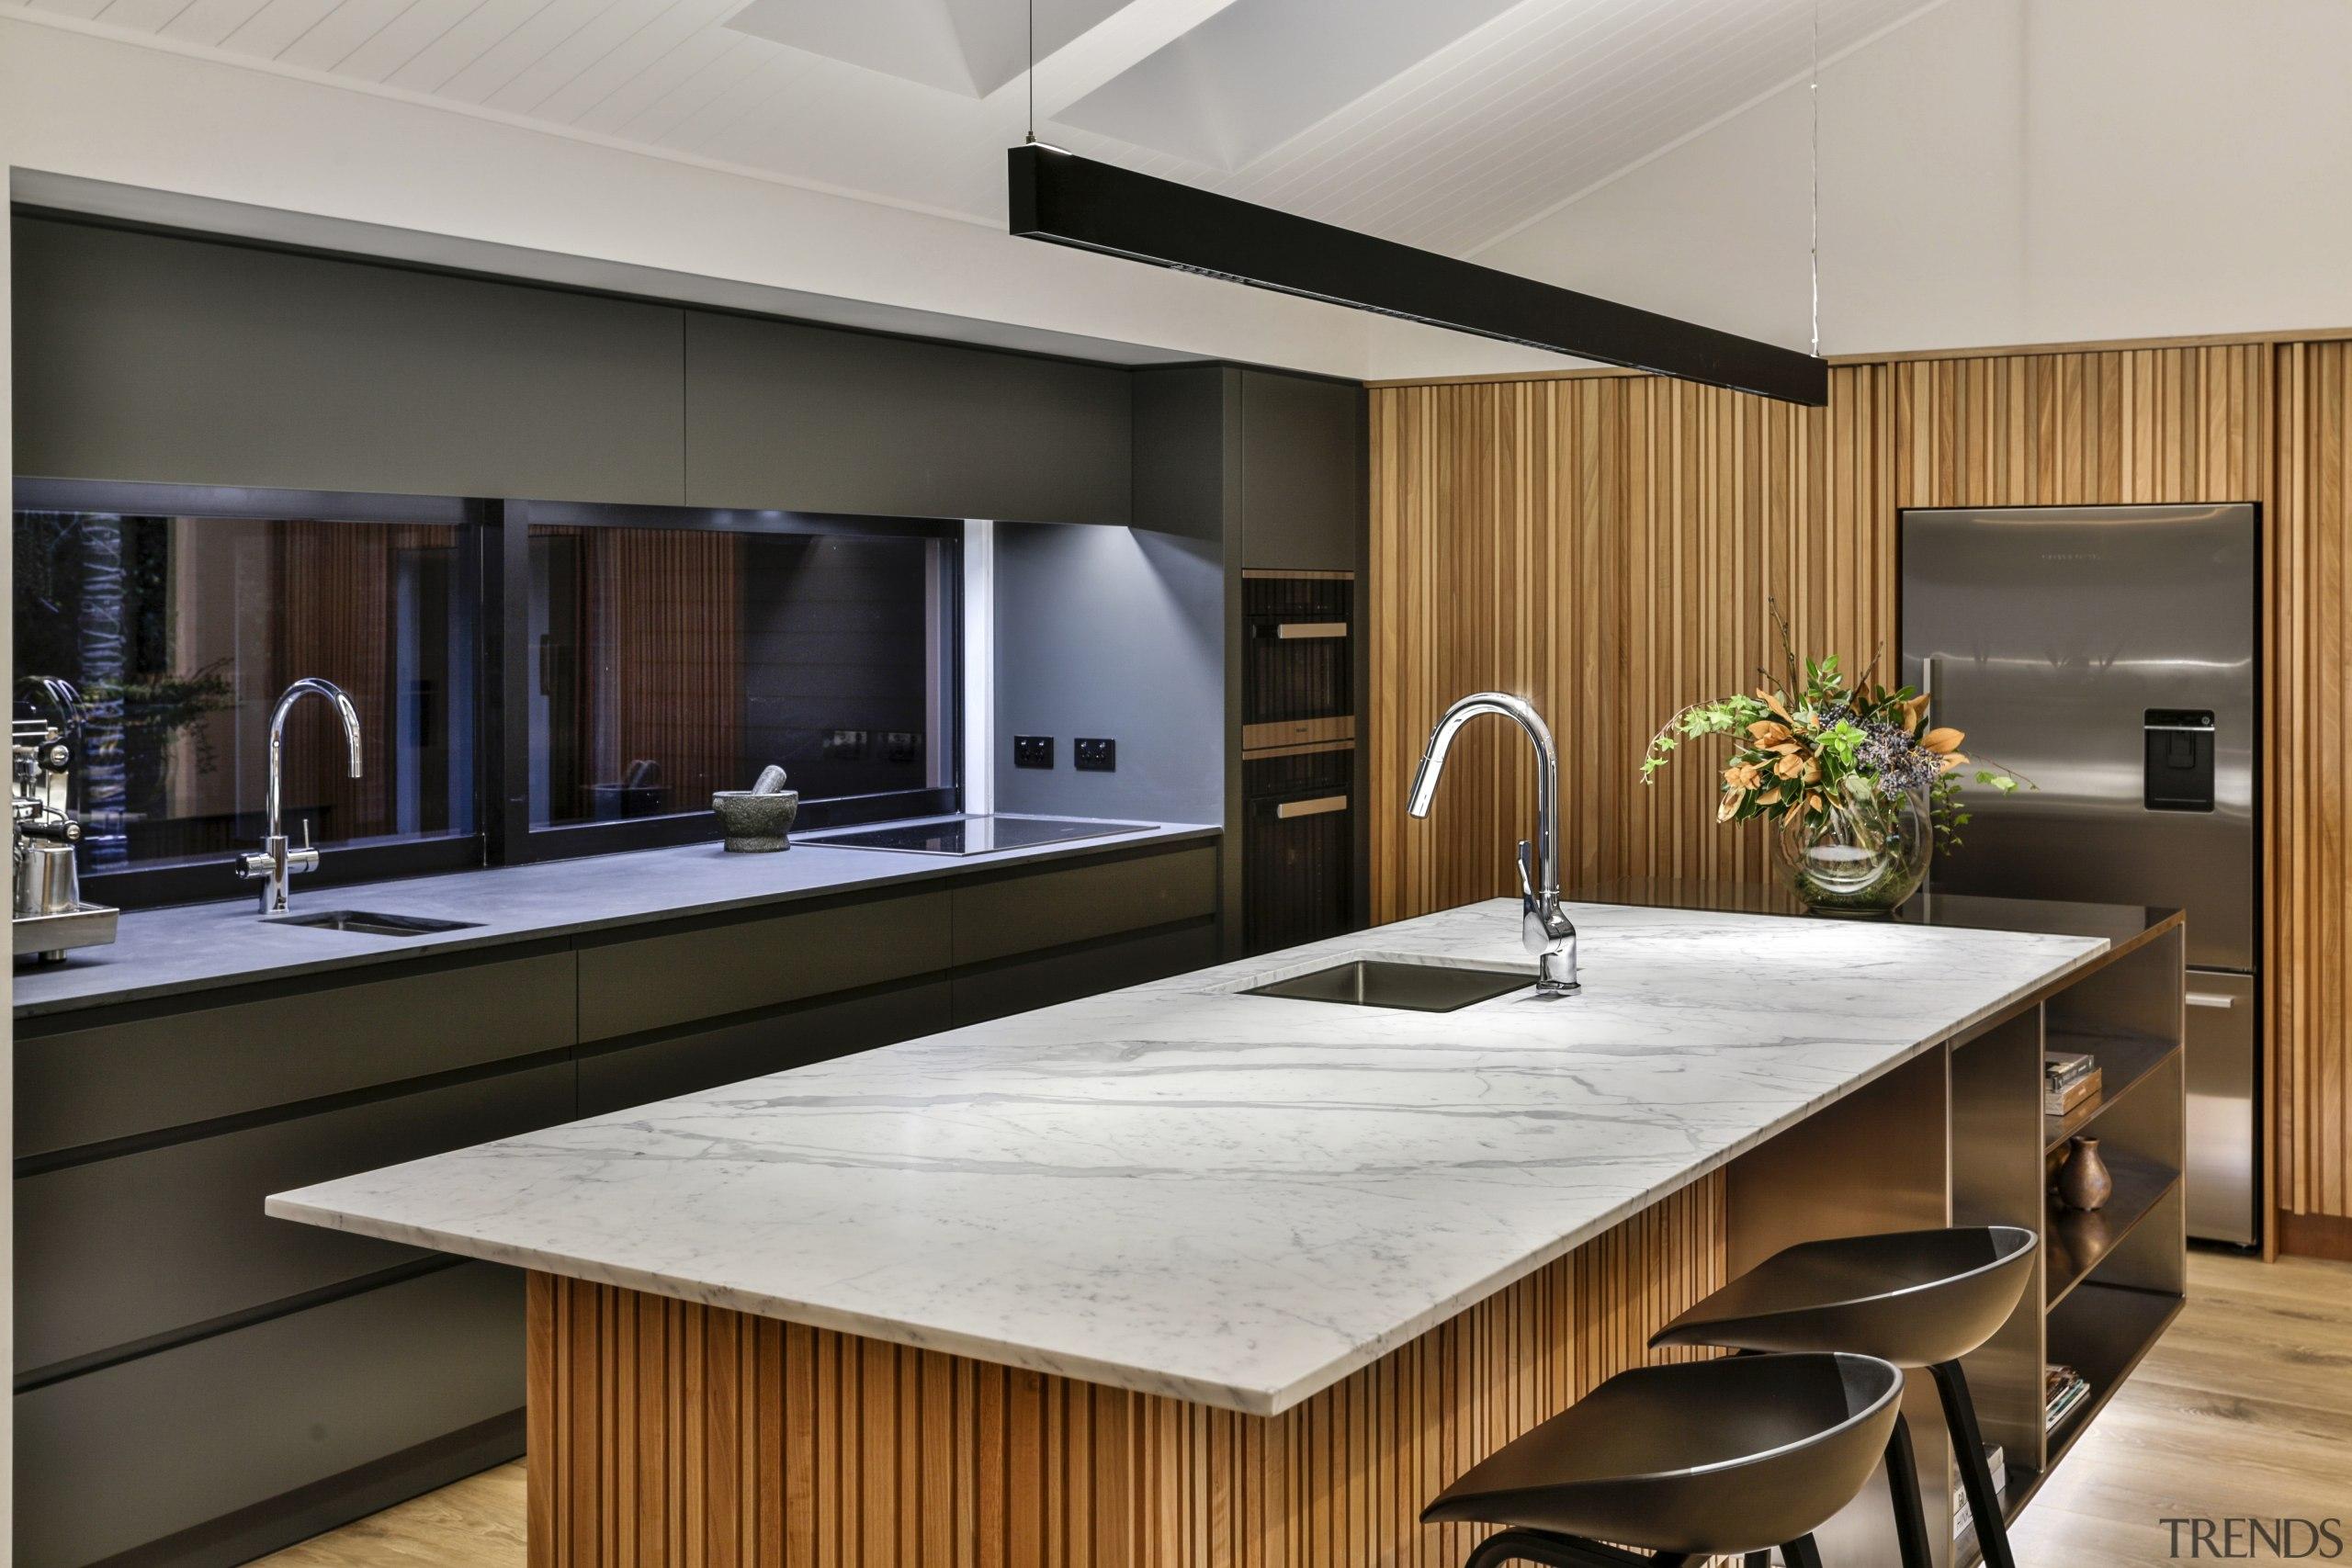 Half Moon Bay - cabinetry   countertop   cabinetry, countertop, cuisine classique, interior design, kitchen, gray, black